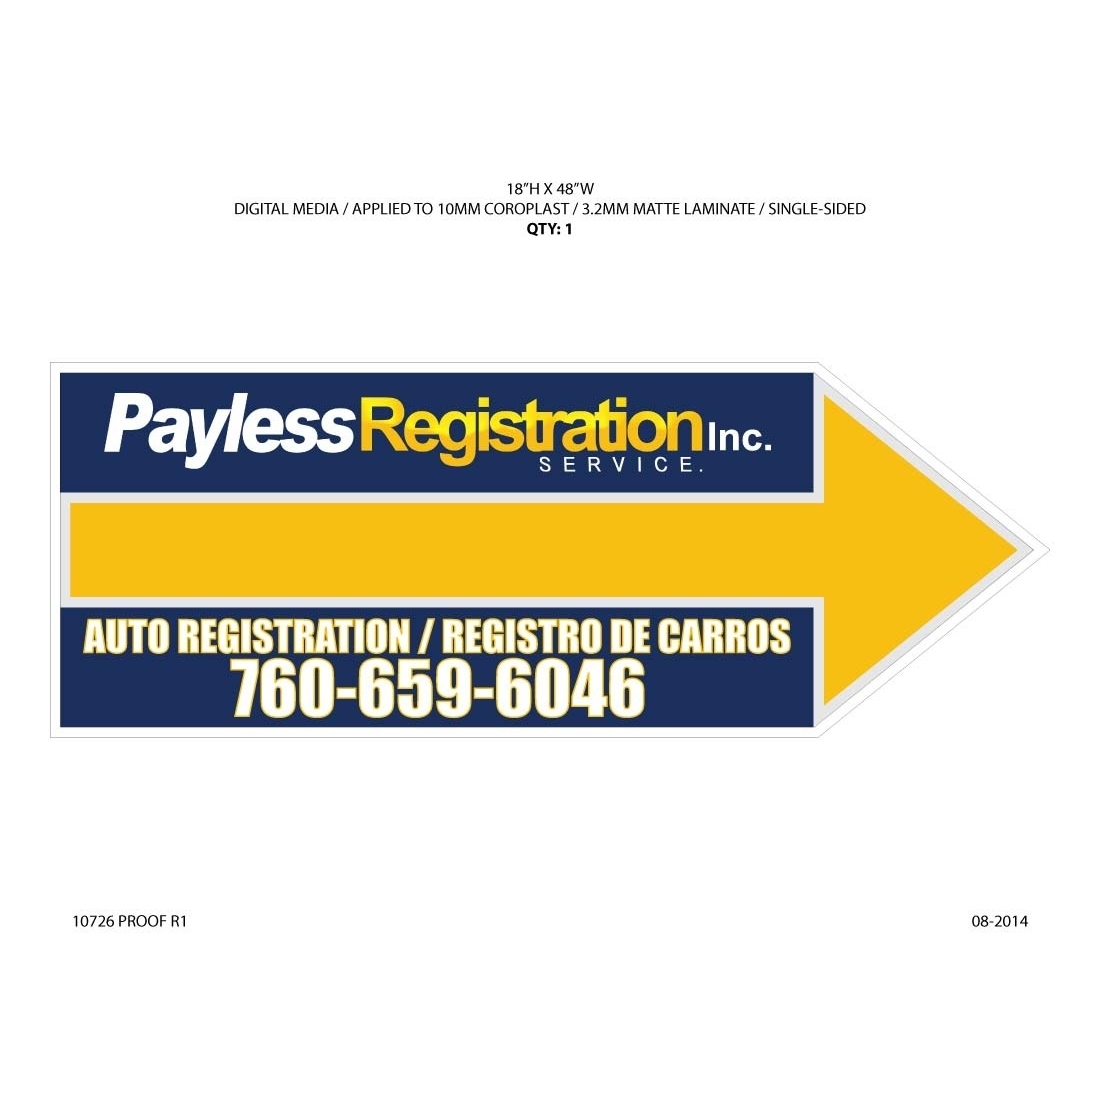 Payless Registration Service Inc